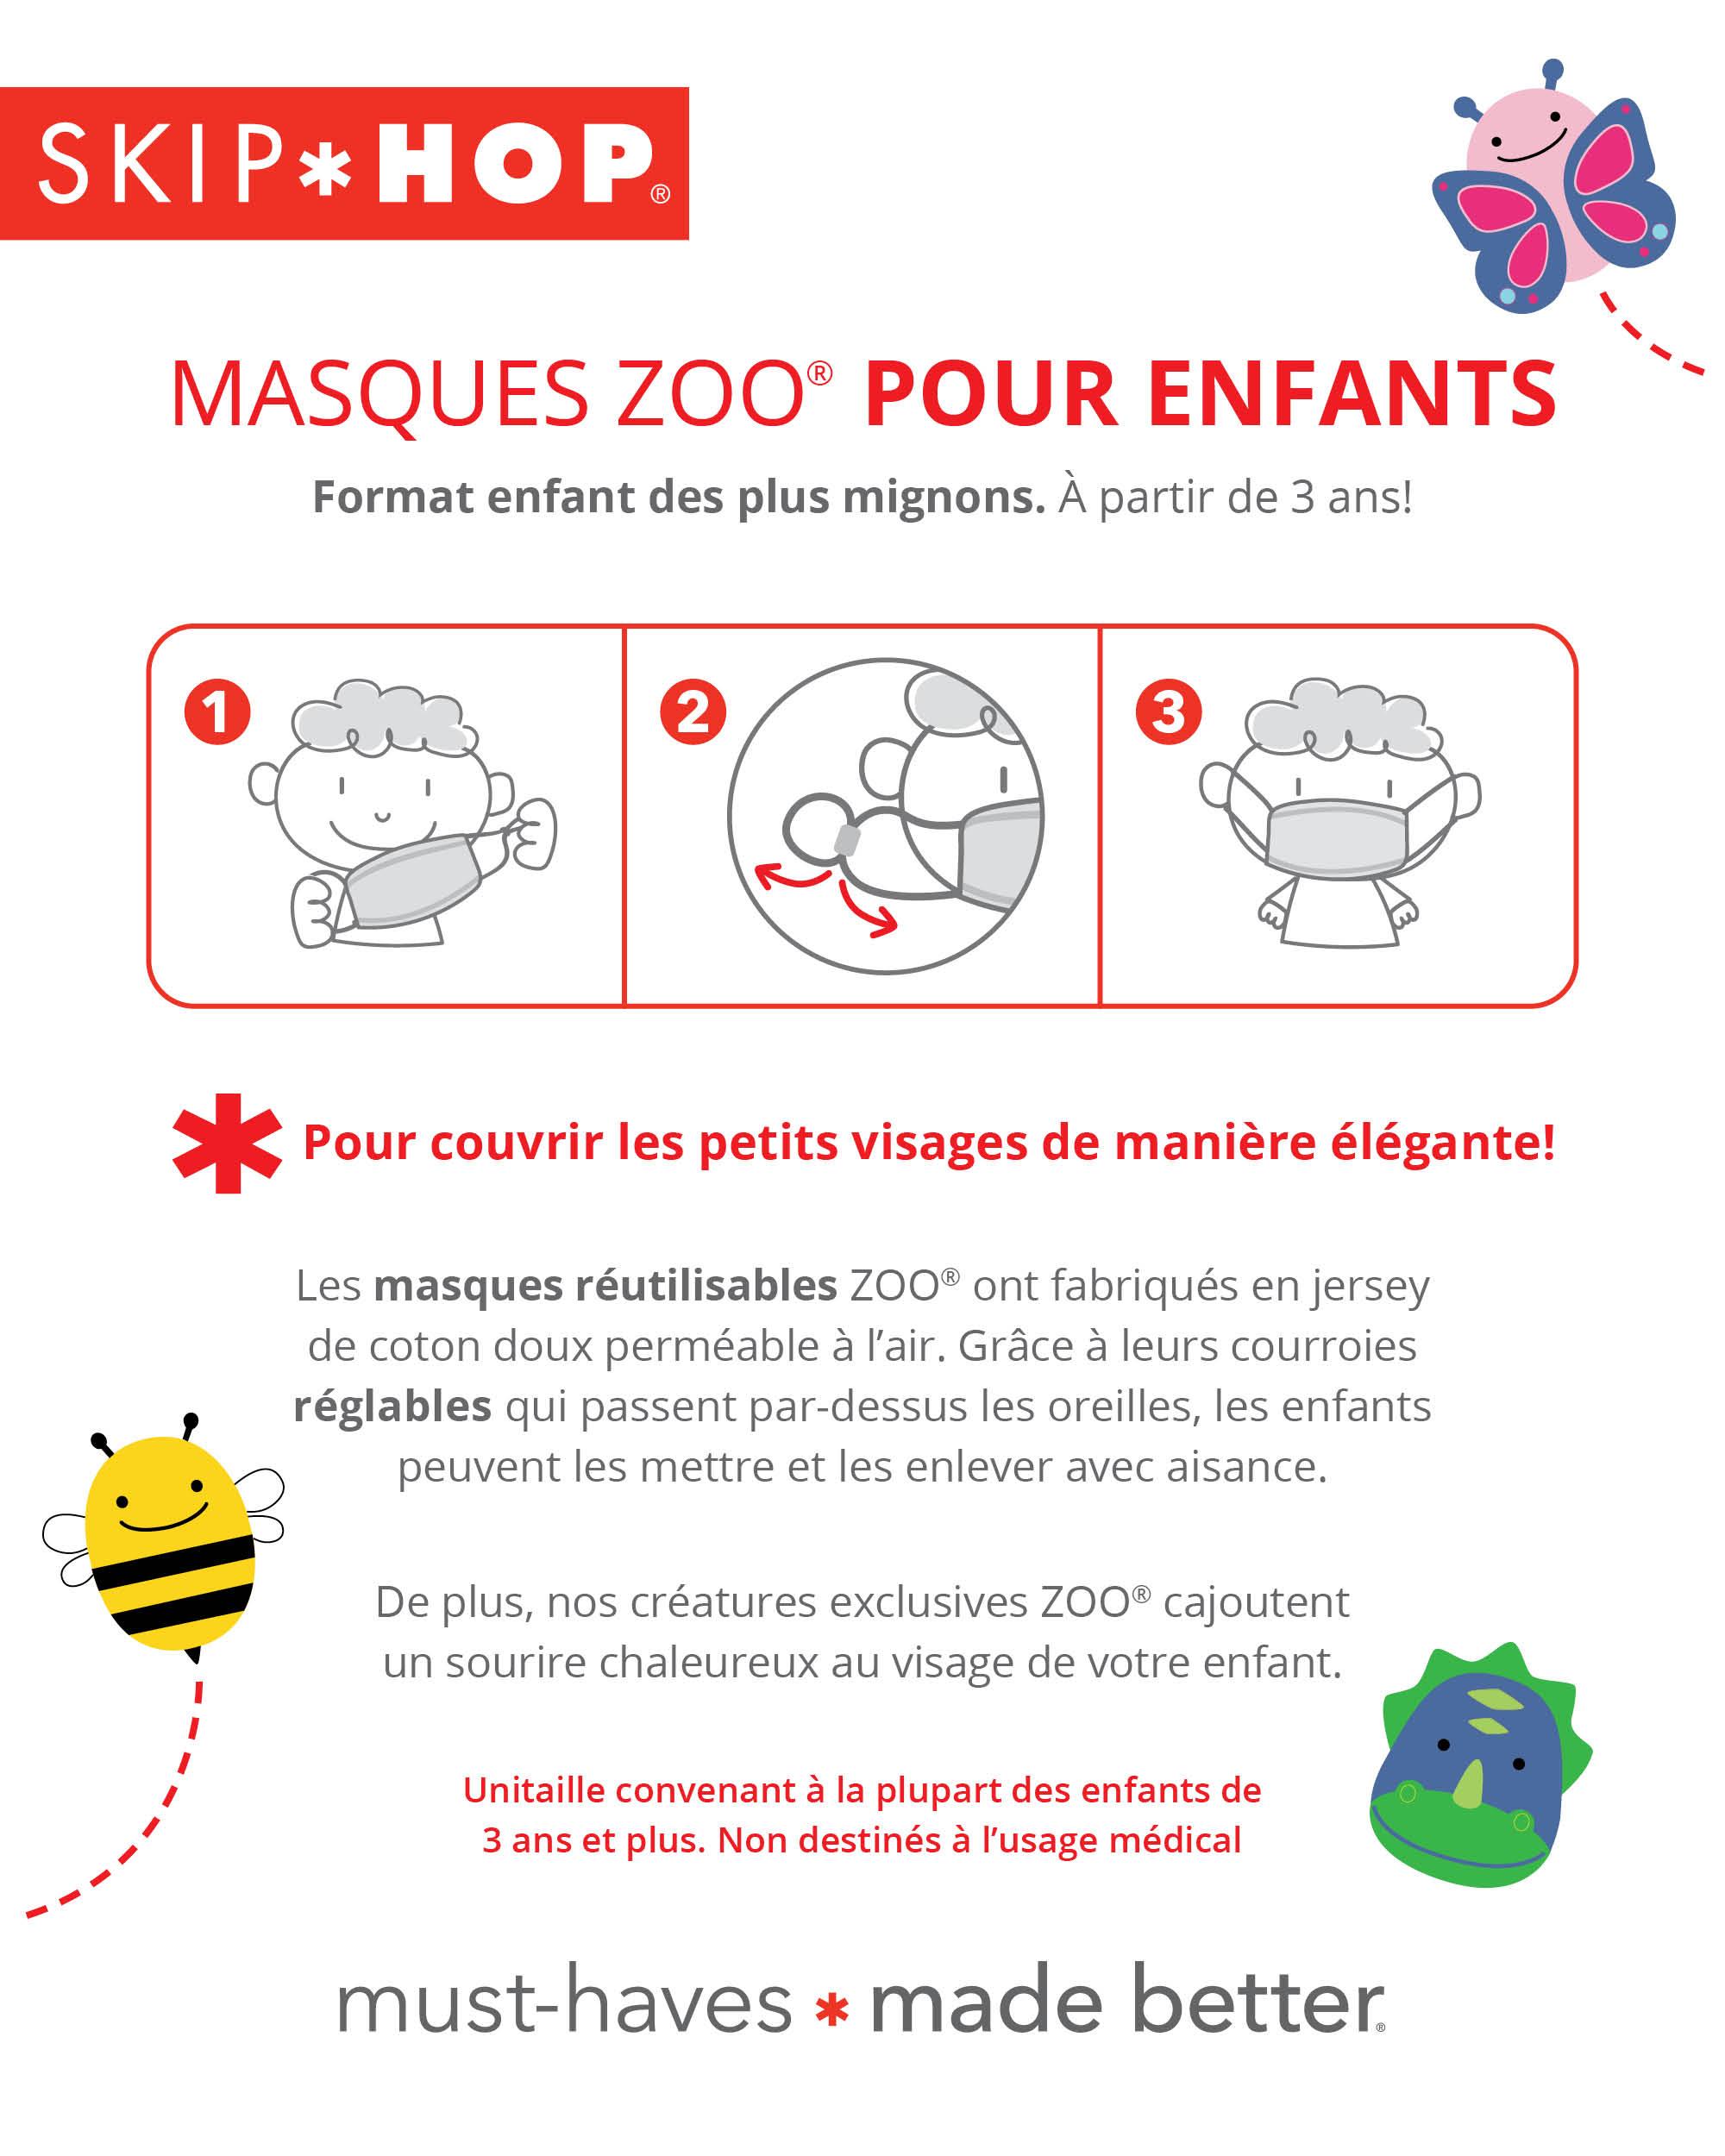 Masques ZOO® pour enfants – Dino